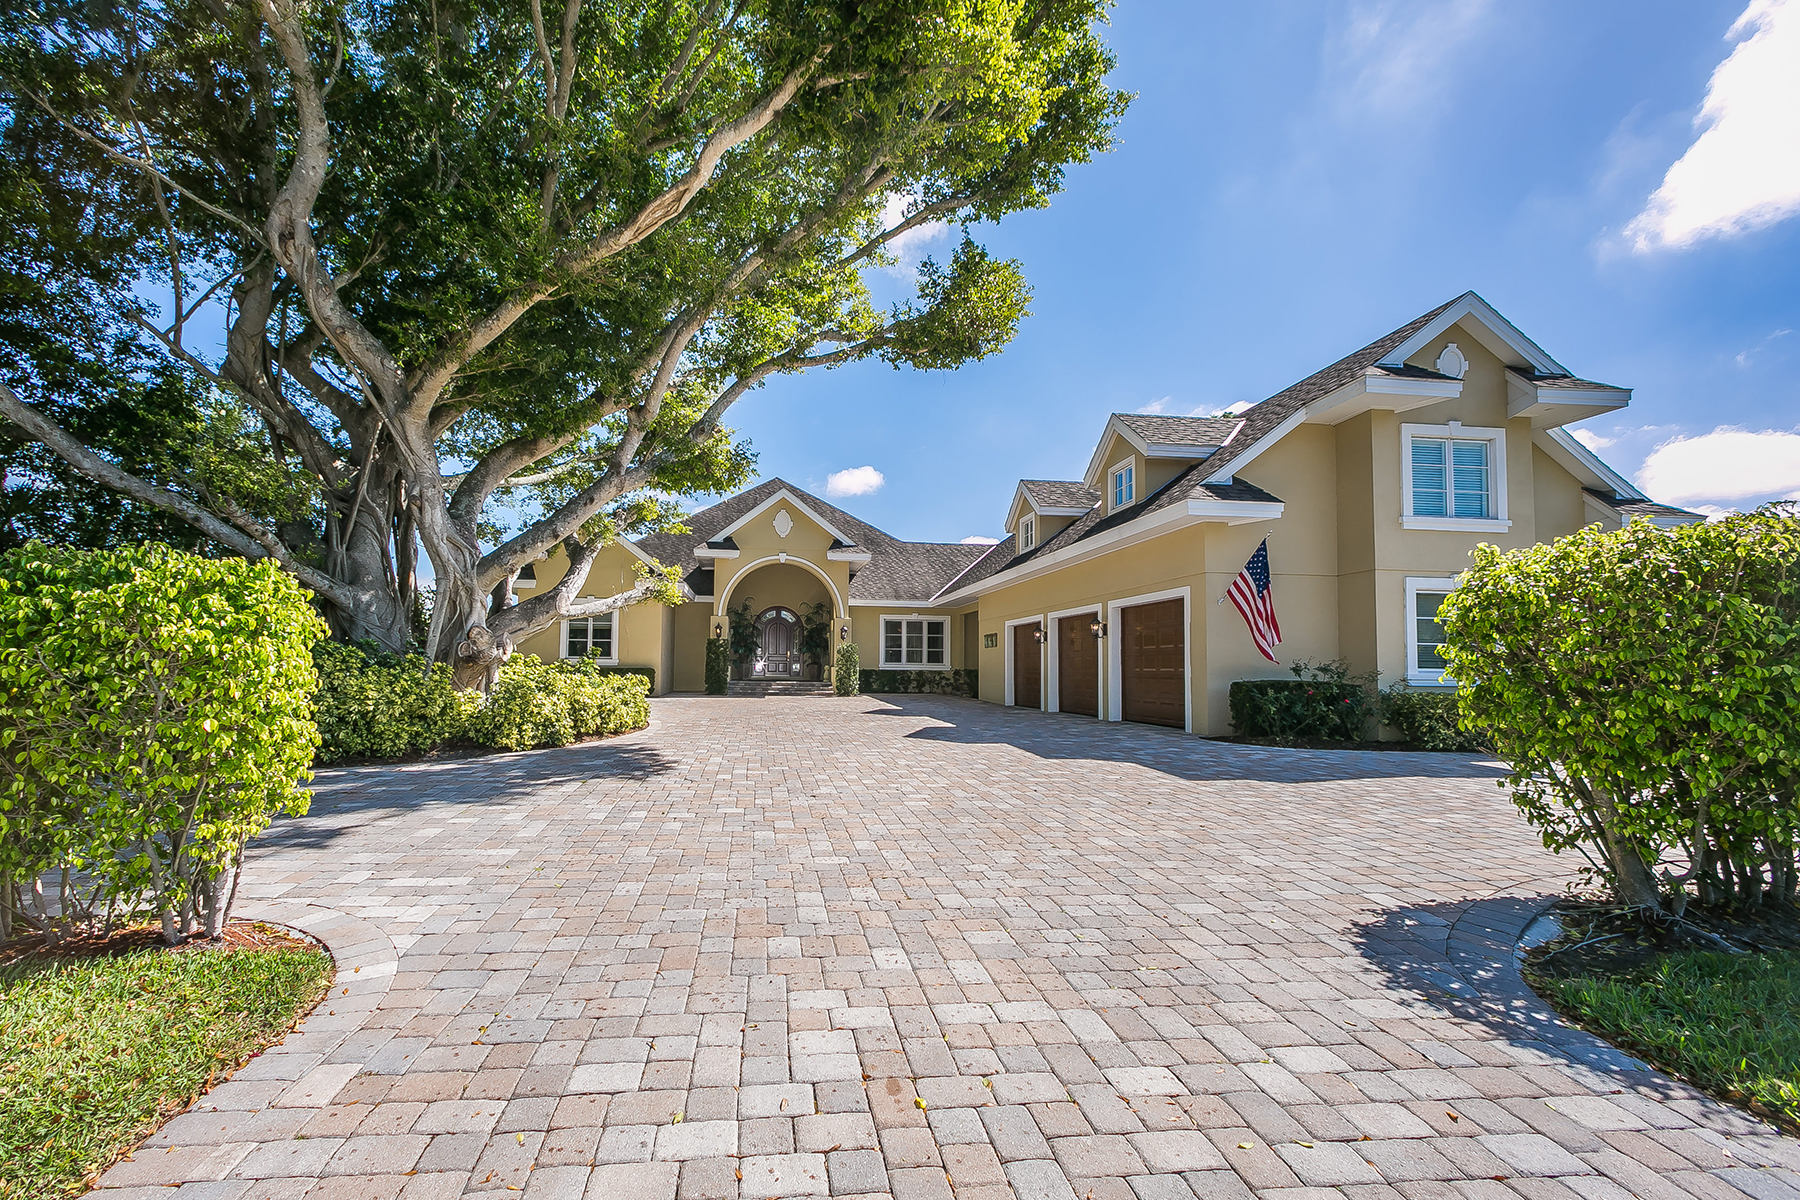 Single Family Home for Sale at GOLF COURSE ESTATES 1175 51st St W Bradenton, Florida, 34209 United States